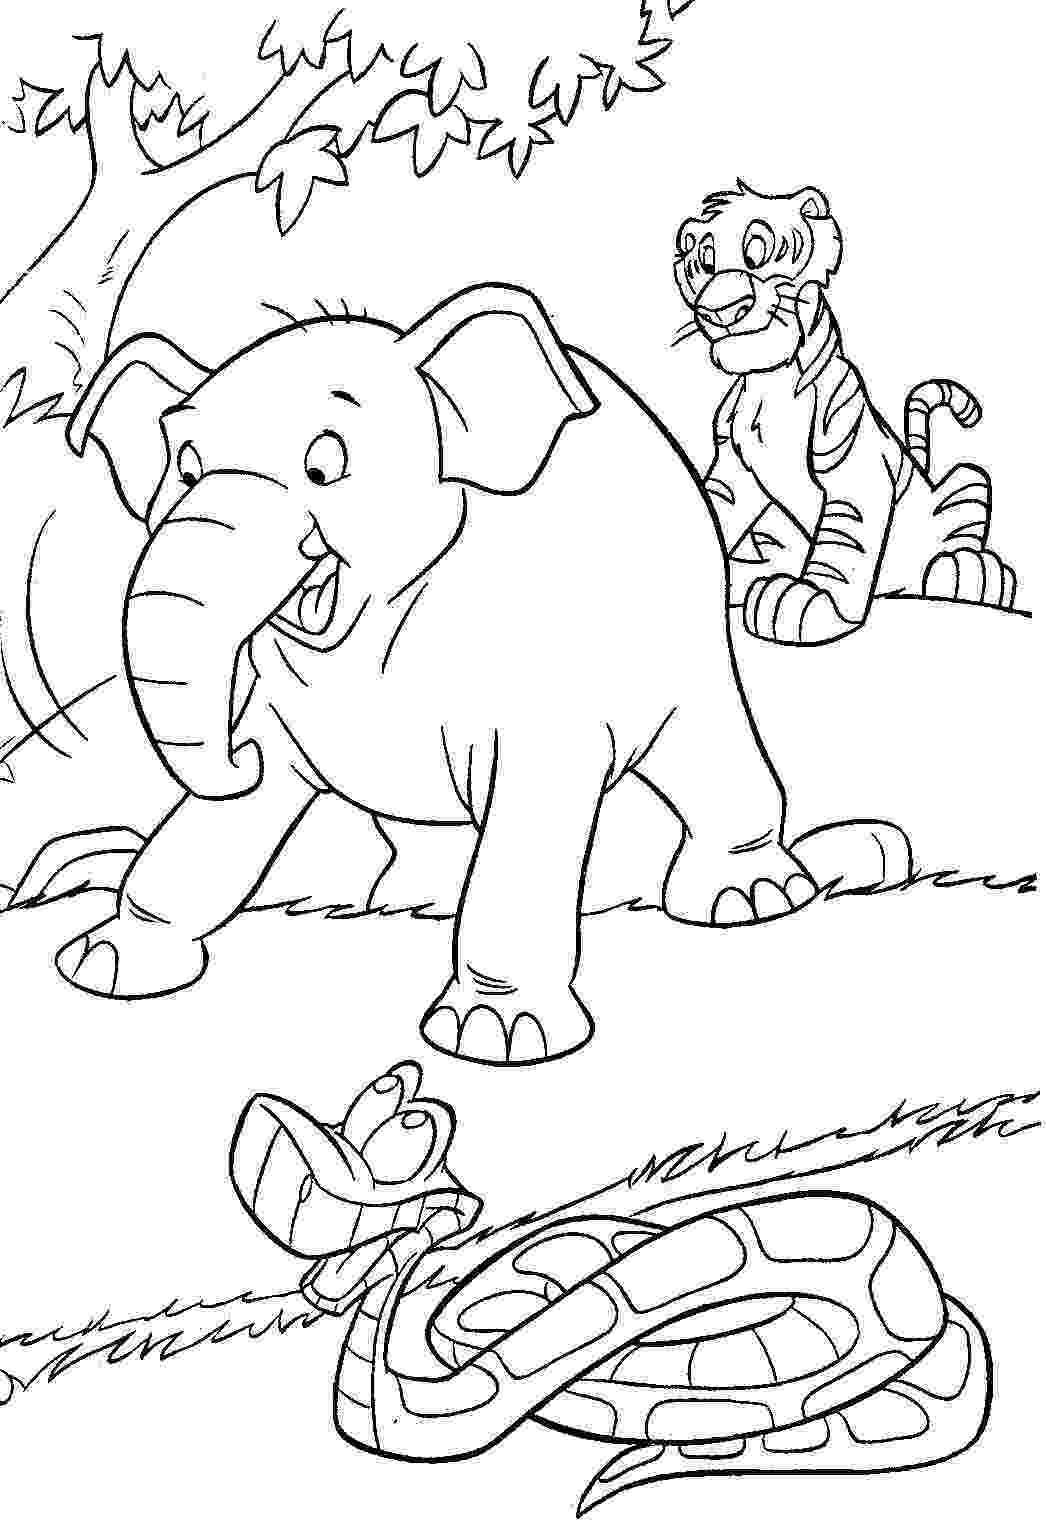 coloring pages jungle jungle safari coloring pages images of animal coloring coloring pages jungle